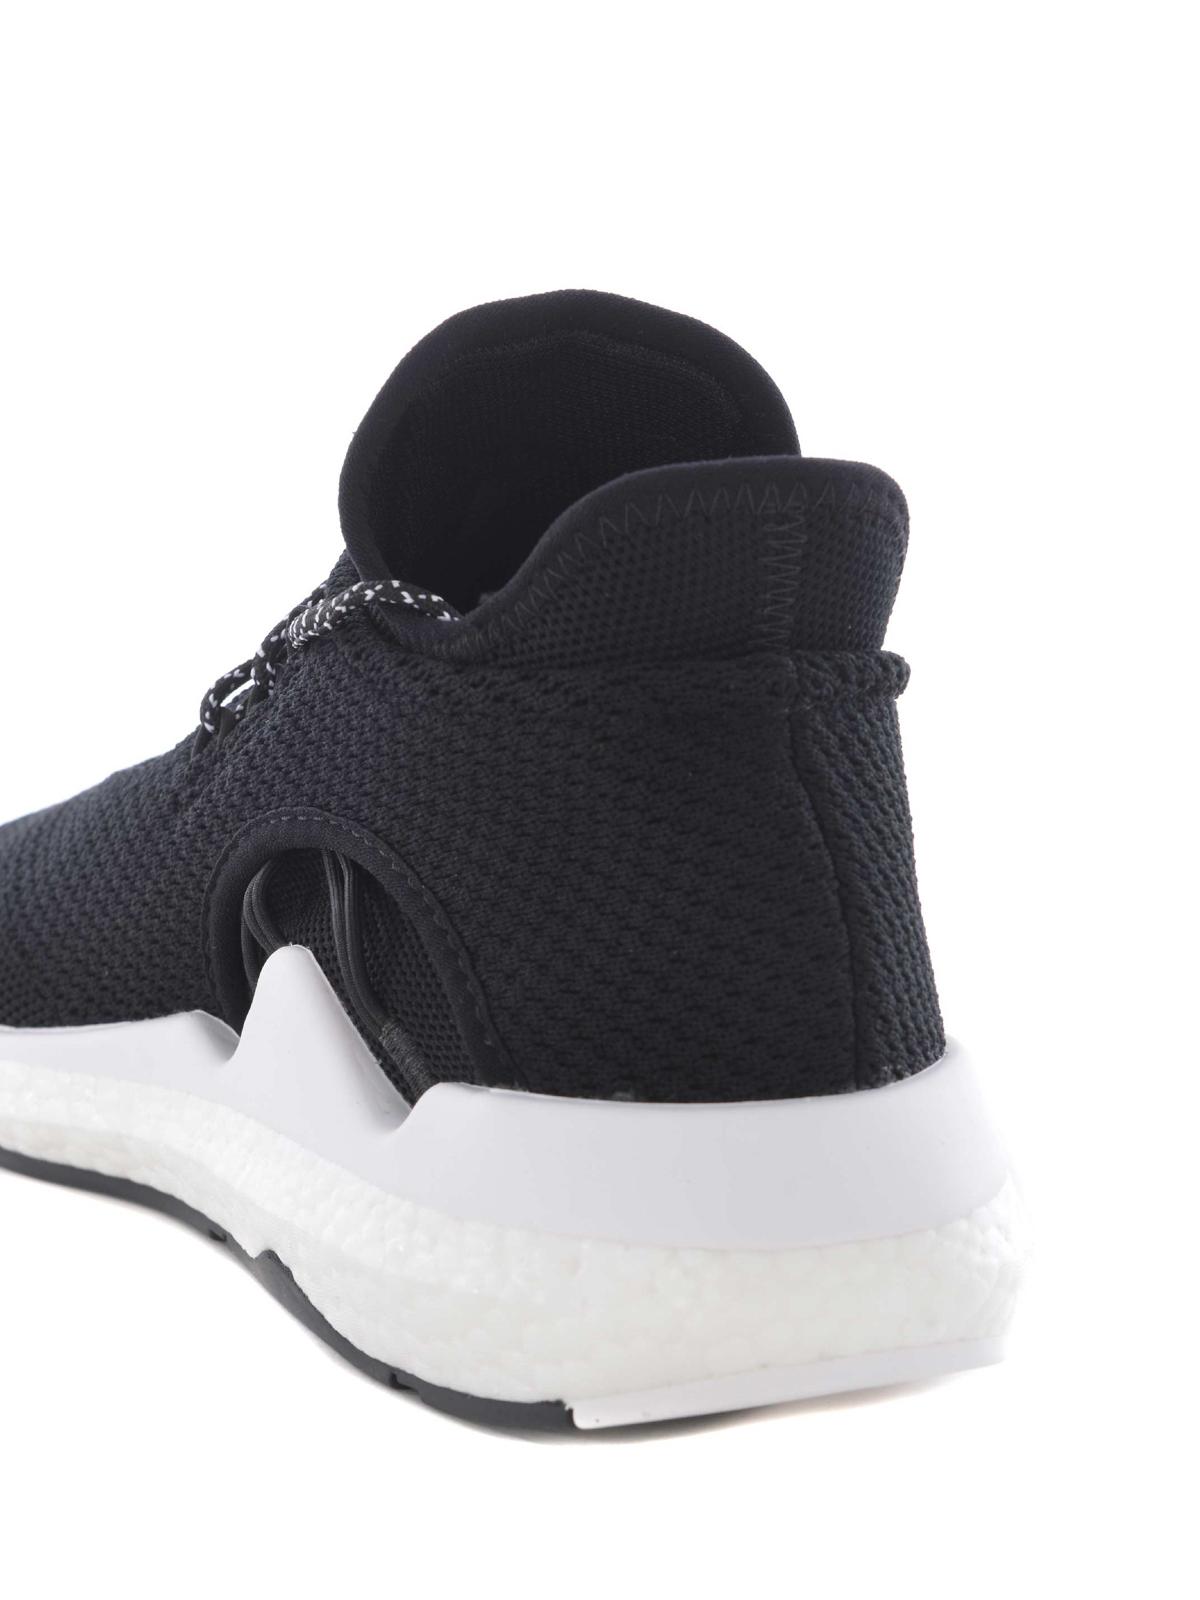 Adidas Y-3 - Trainer Saikou - sneakers - AC7196 COREBLACKFTWRW ... c4077b739cb